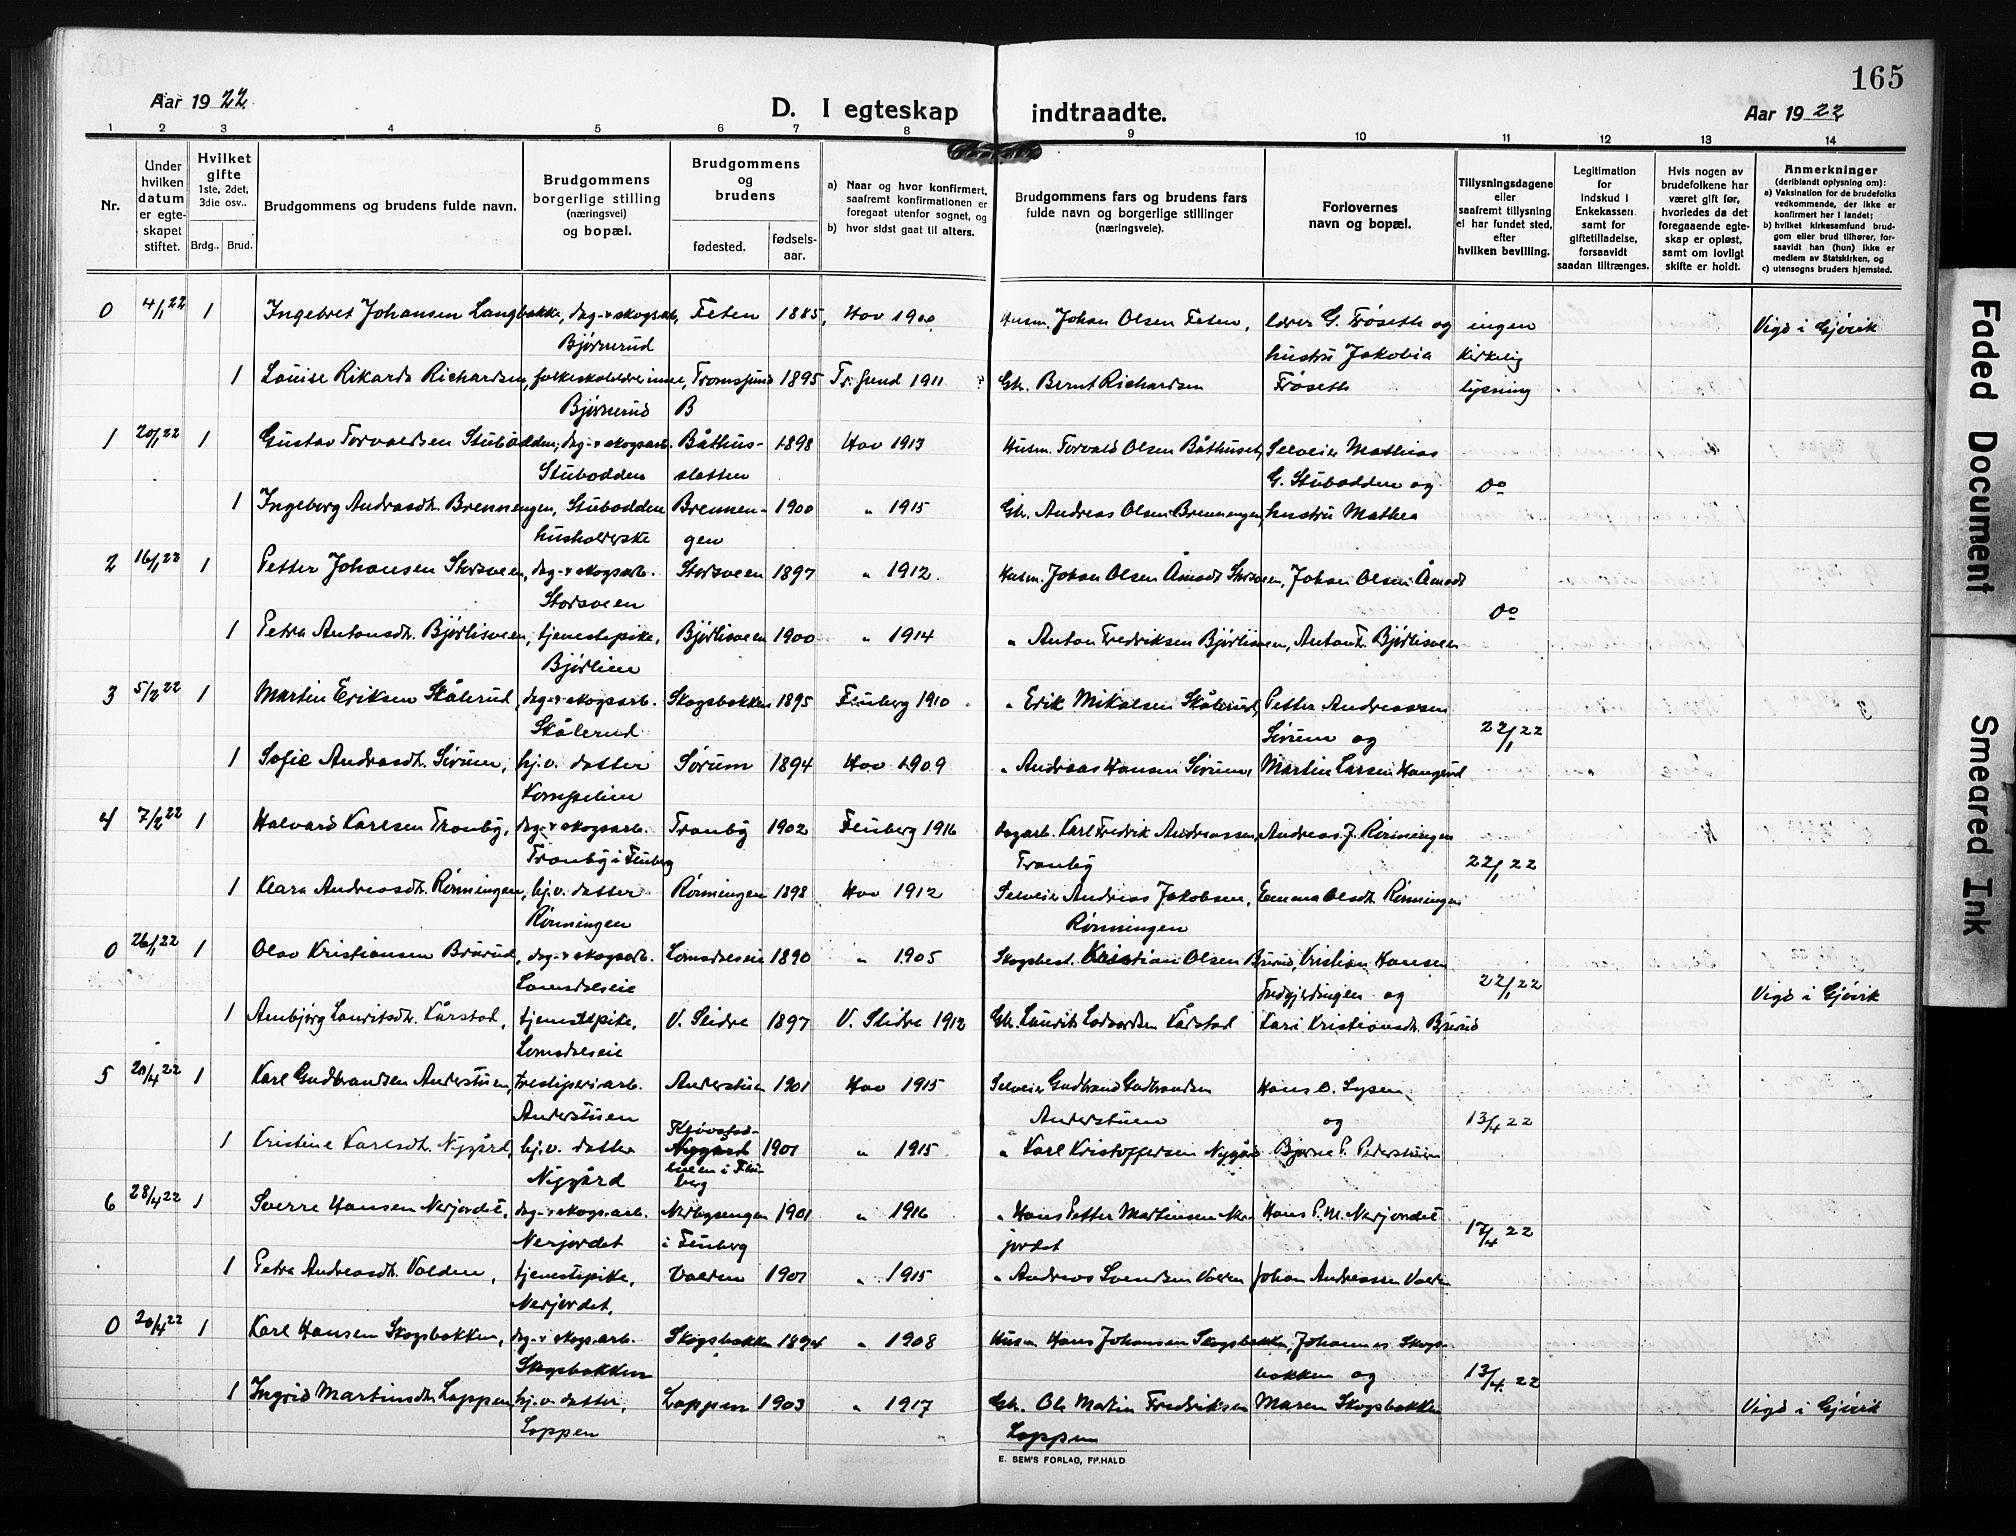 SAH, Søndre Land prestekontor, L/L0007: Klokkerbok nr. 7, 1915-1932, s. 165